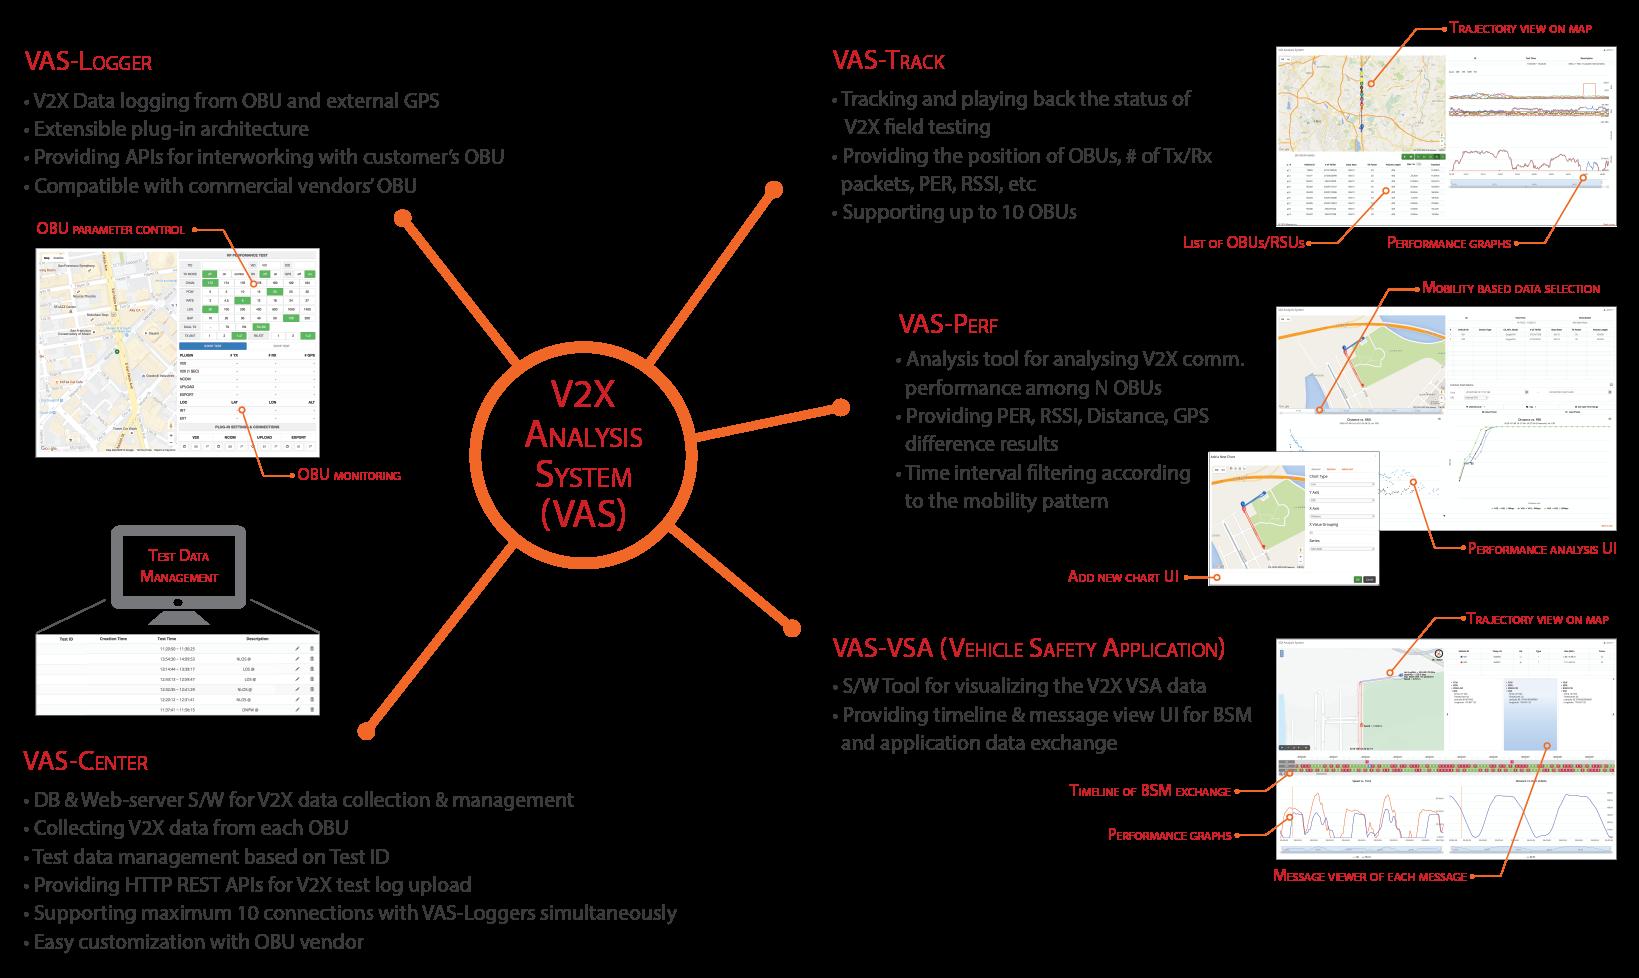 VAS Overview